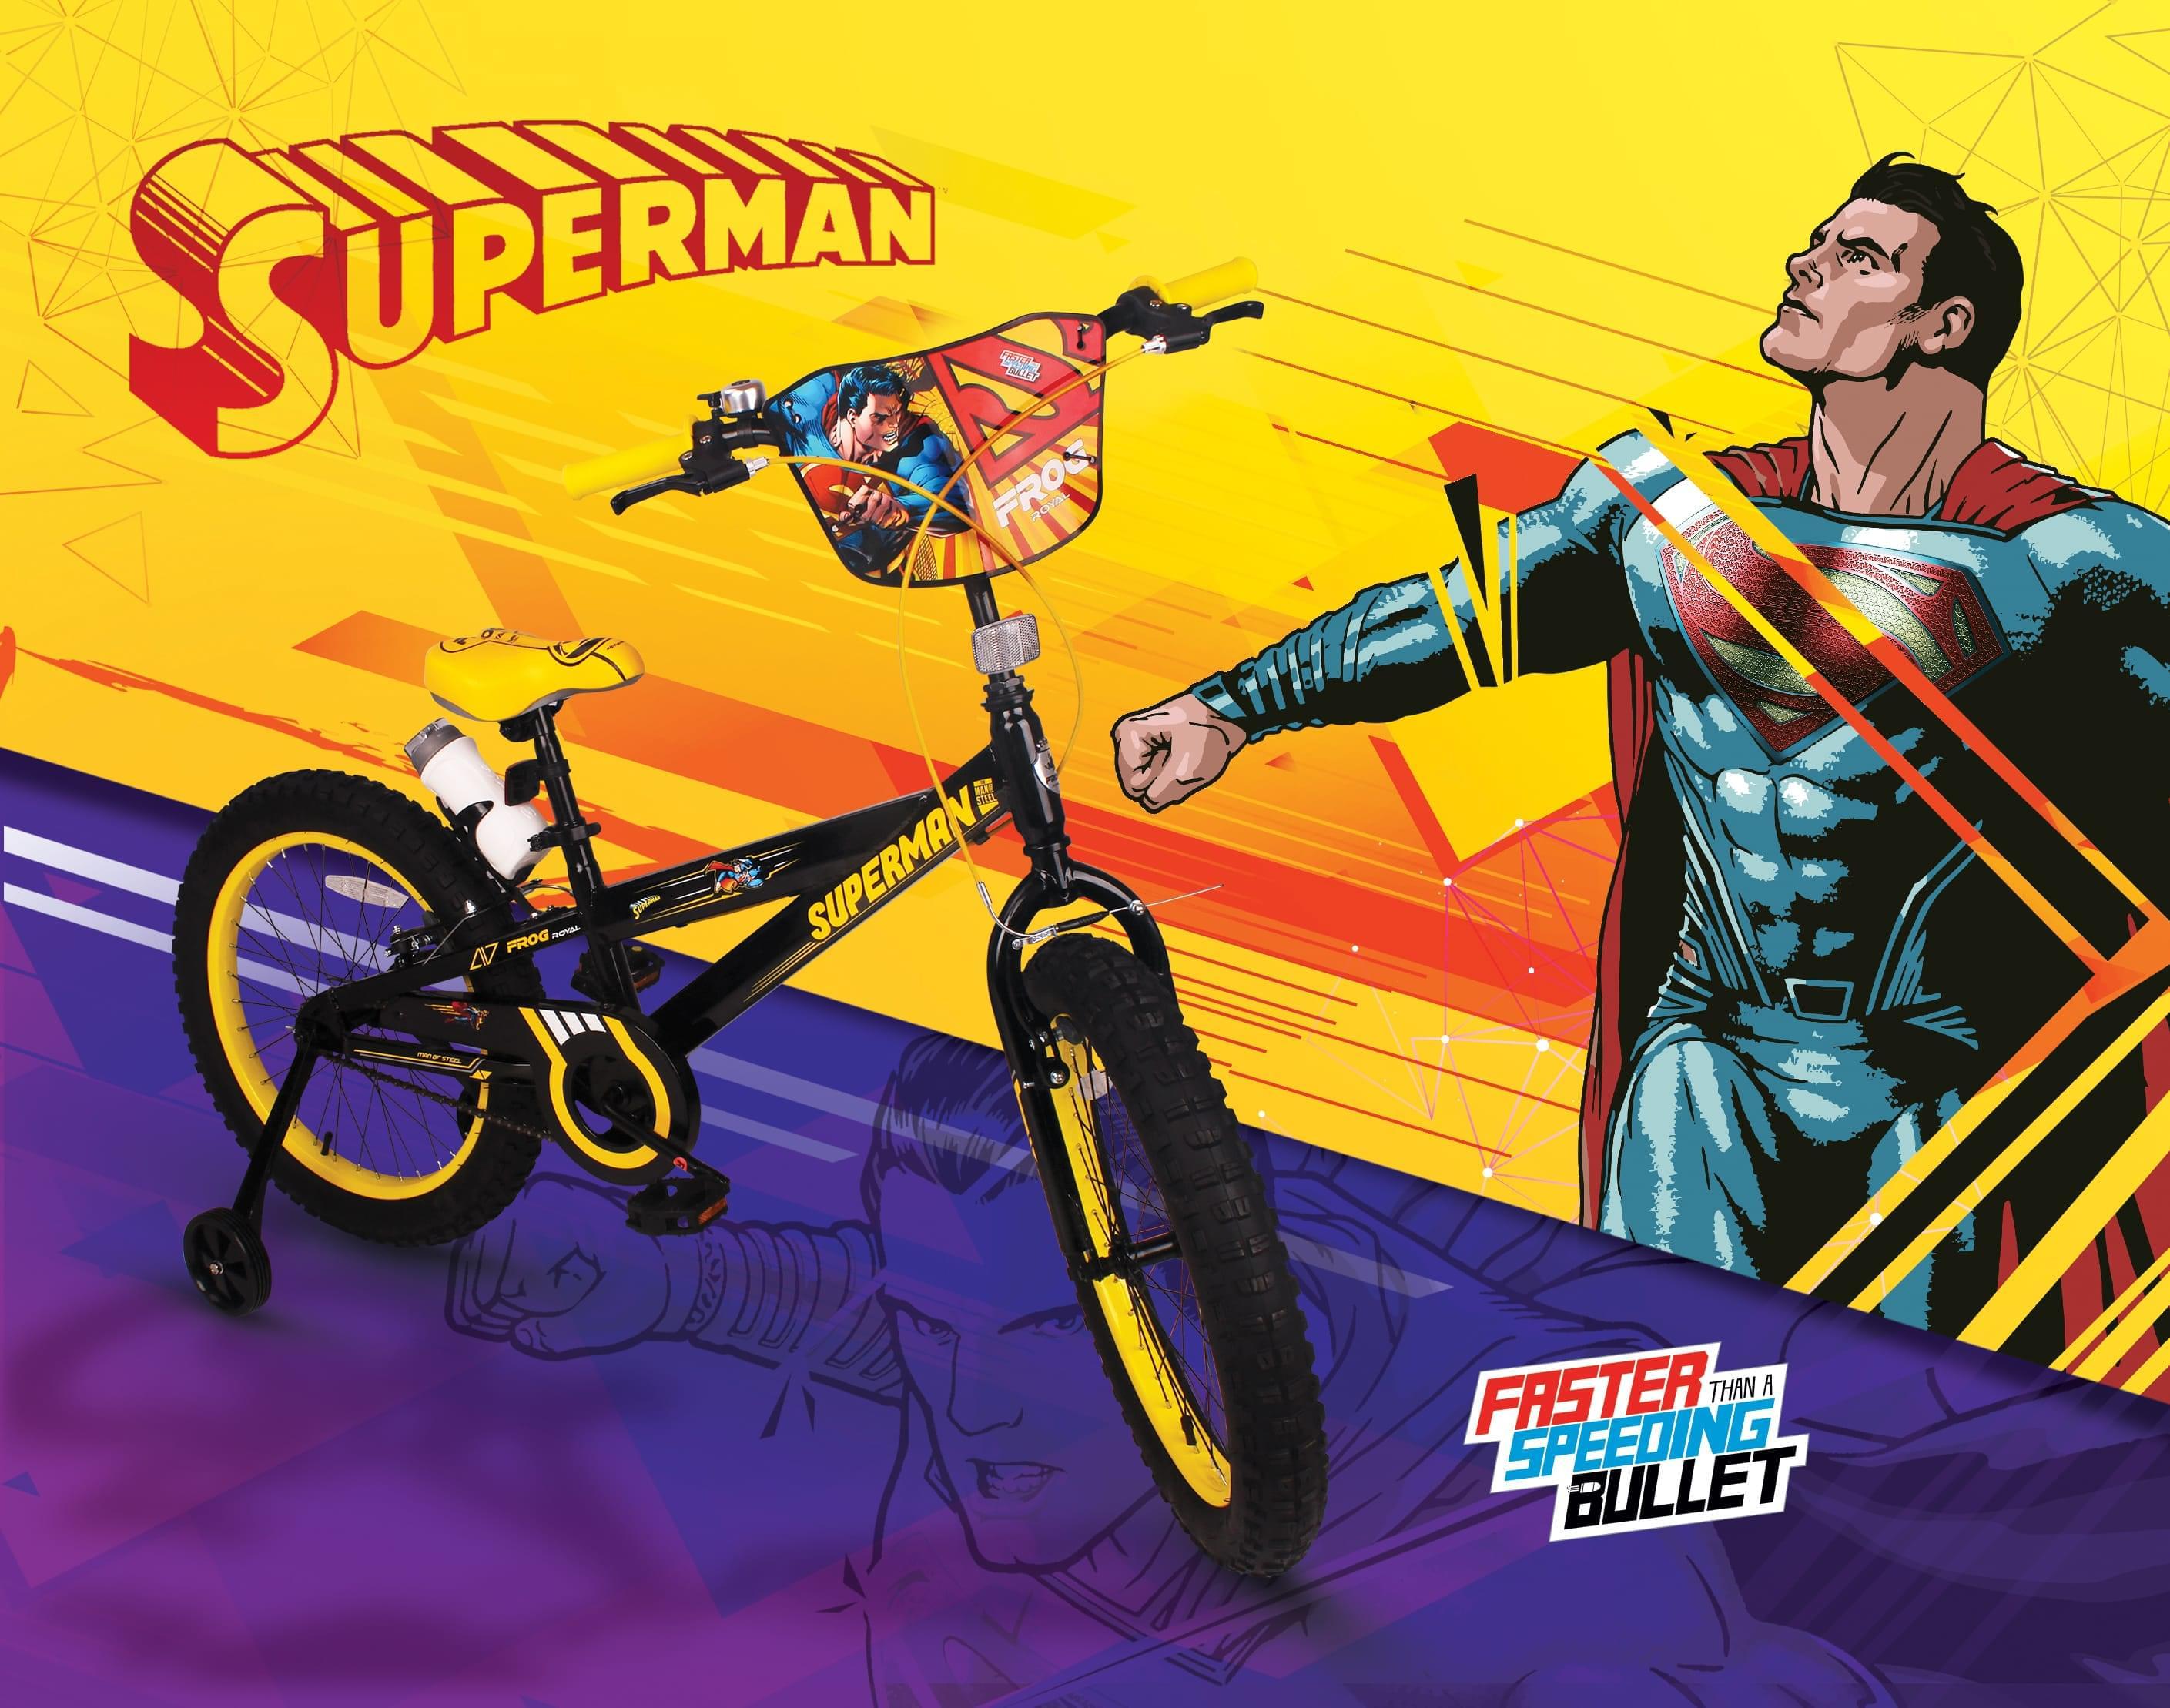 Superman 16 image 2